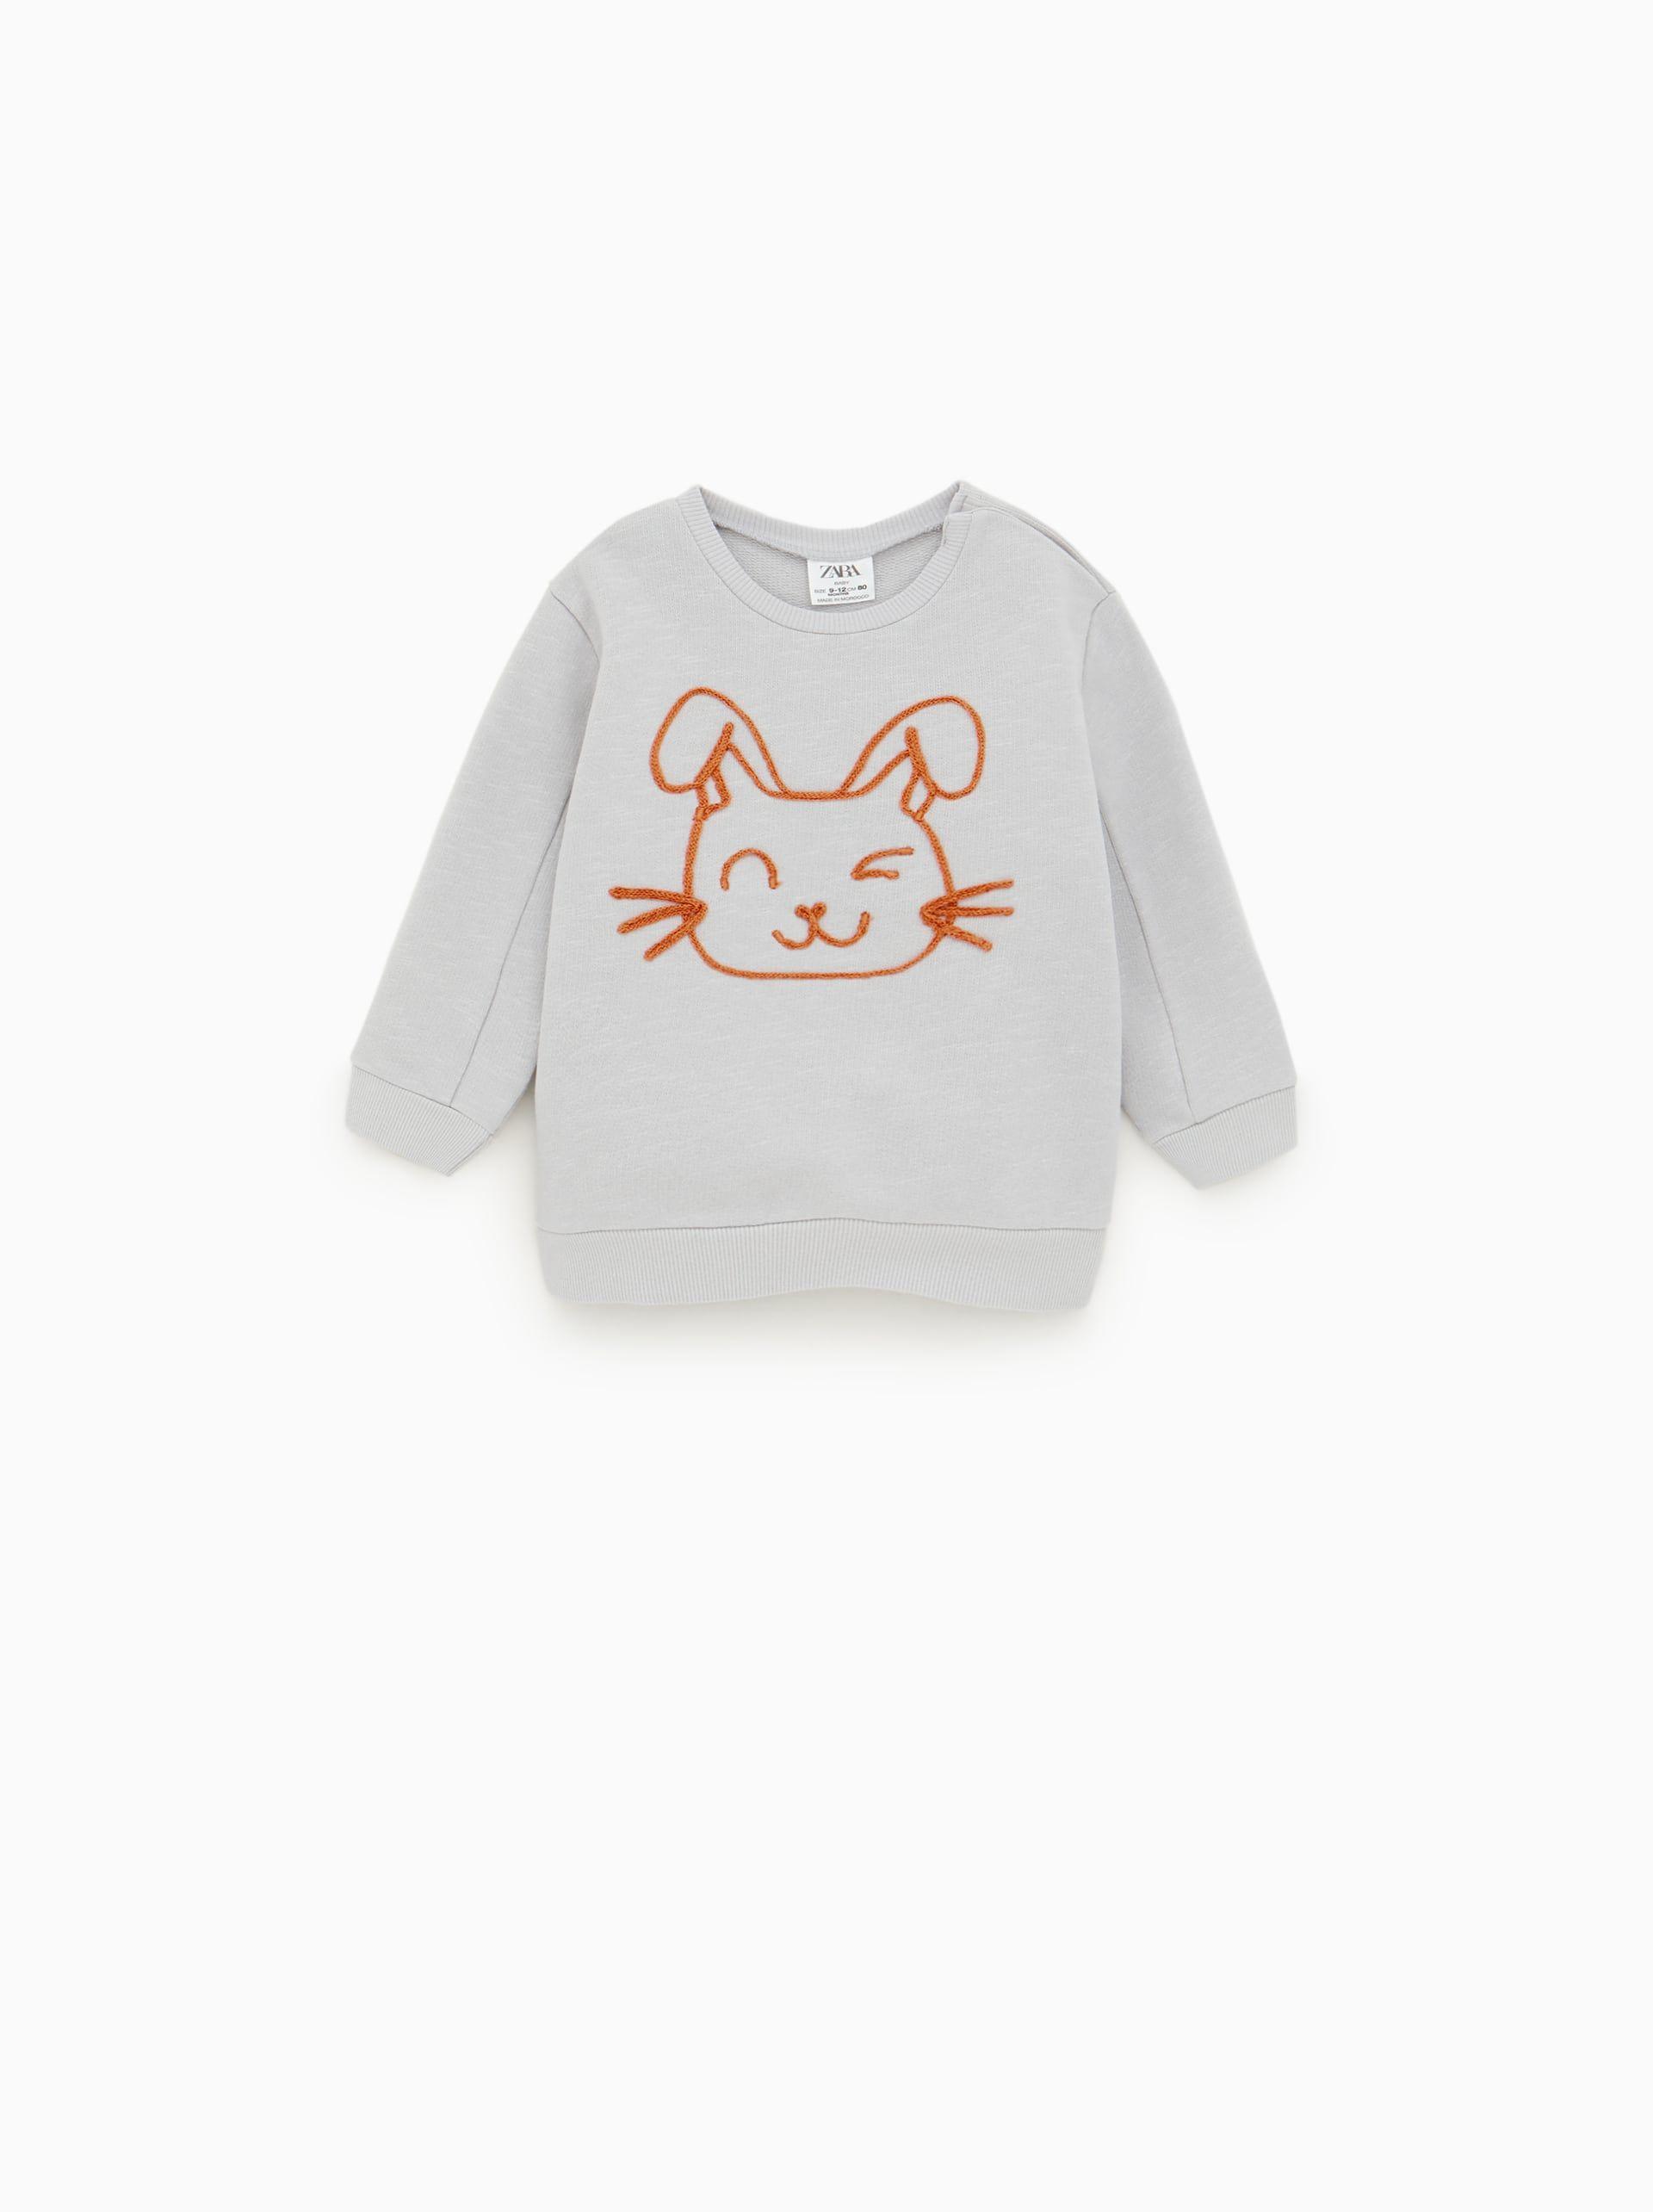 Baby Oversized Sweatshirt White [ 1484 x 950 Pixel ]